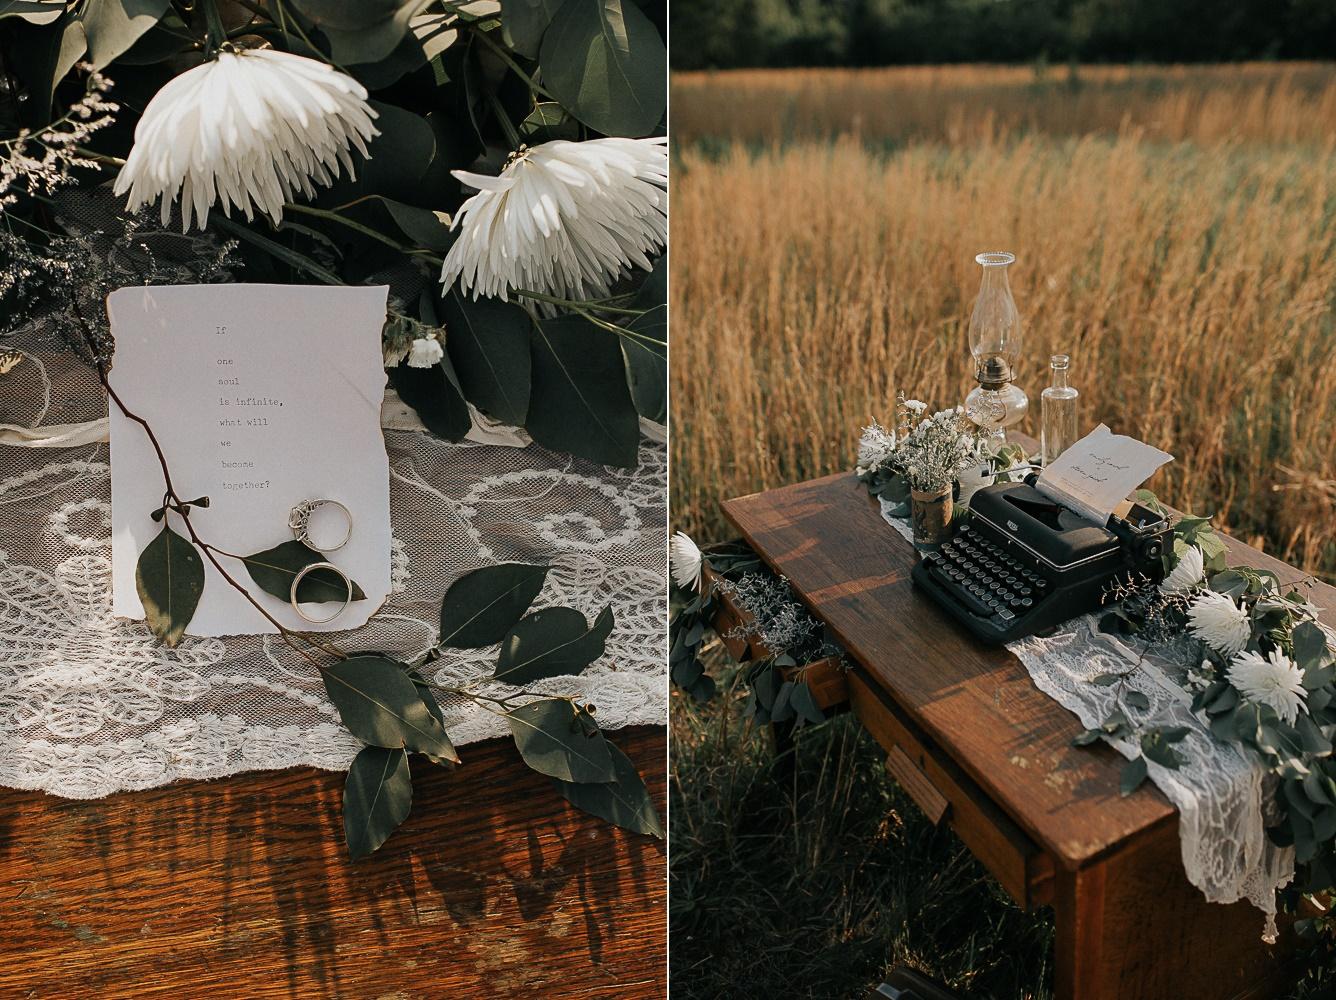 Cassie Cook Photography-Memphis TN-portrait and wedding photographer -6893-horz.jpg